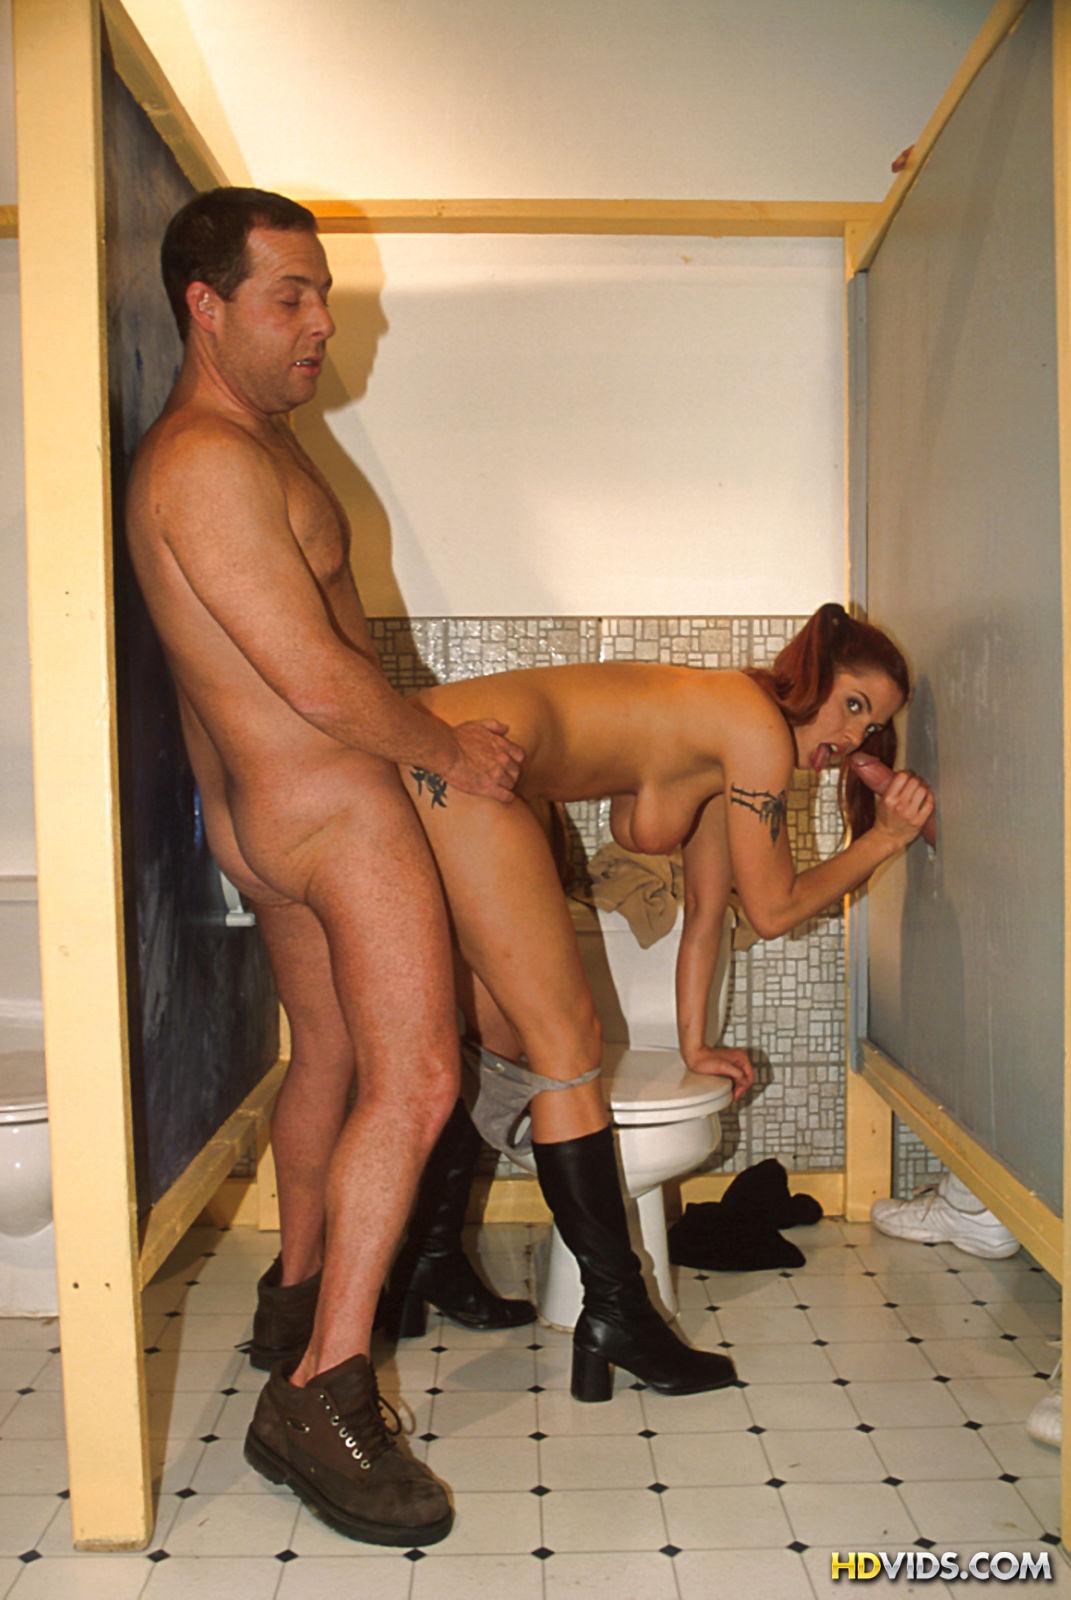 intsest-v-tualete